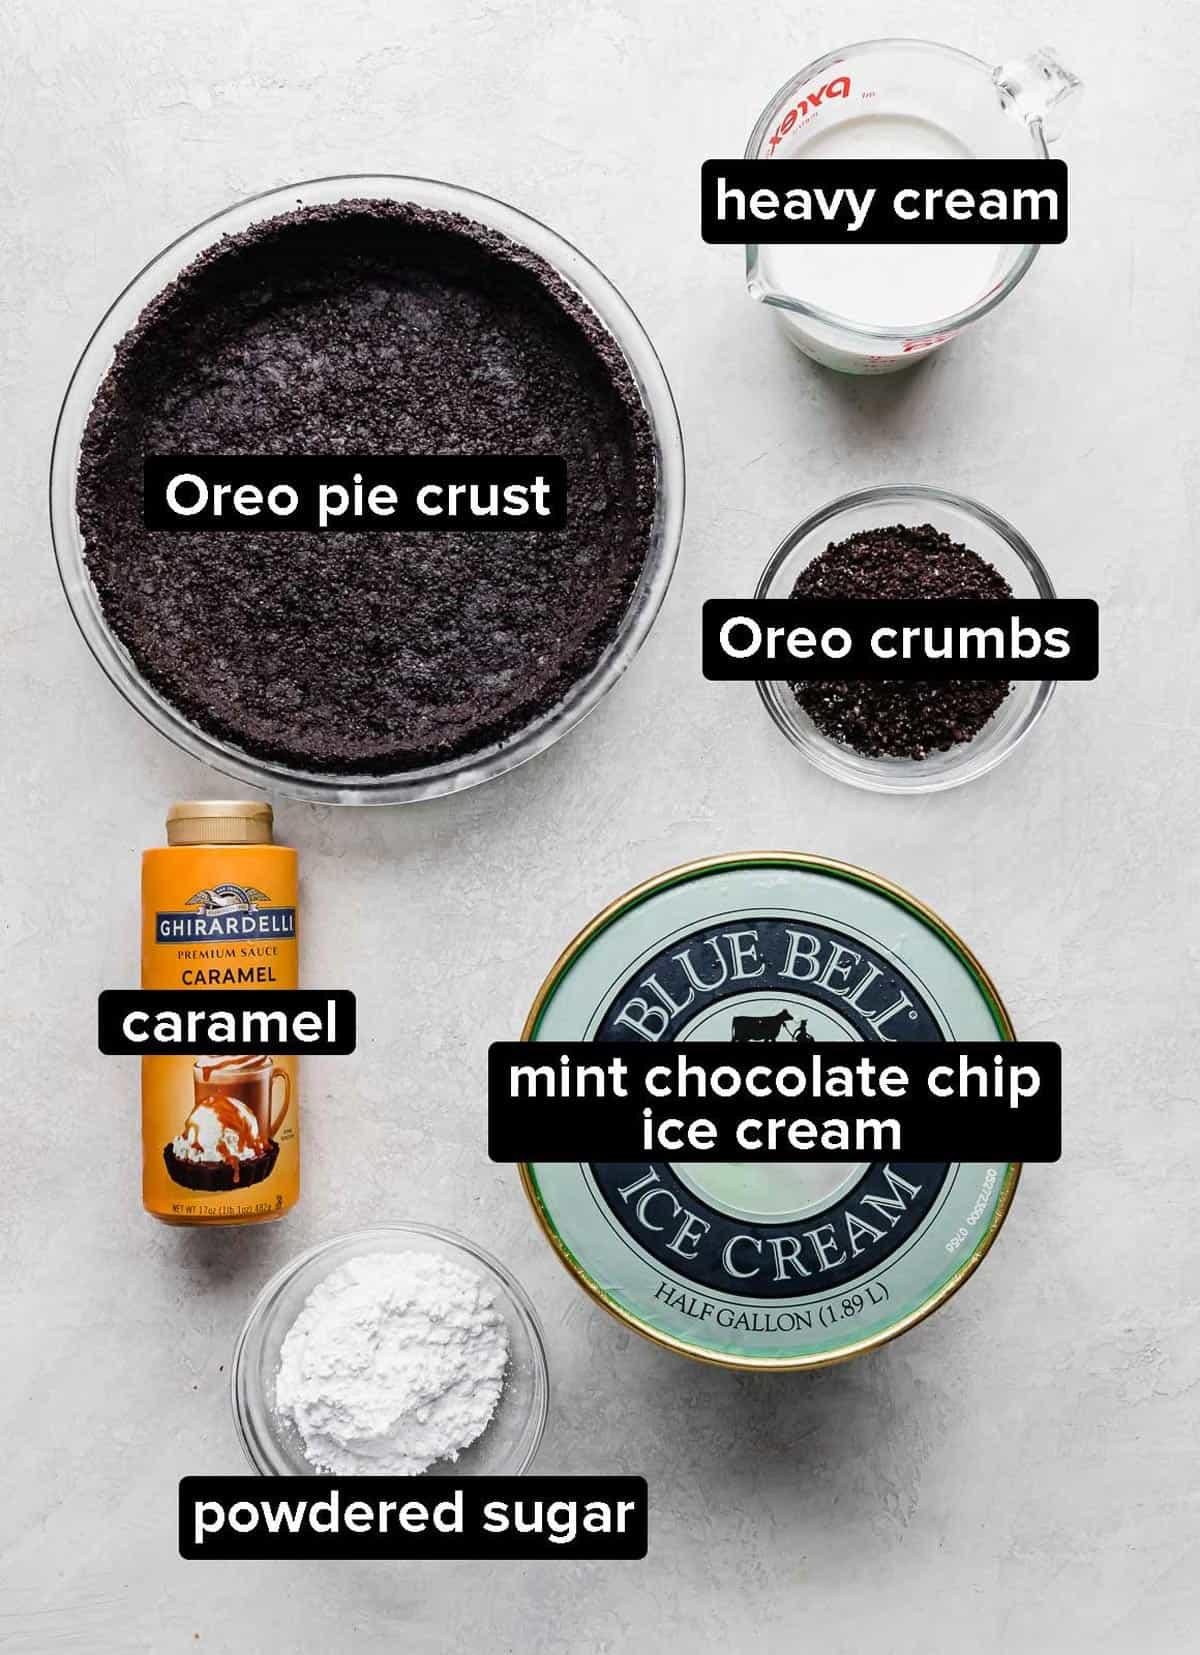 Asphalt Pie ingredients on a gray background.